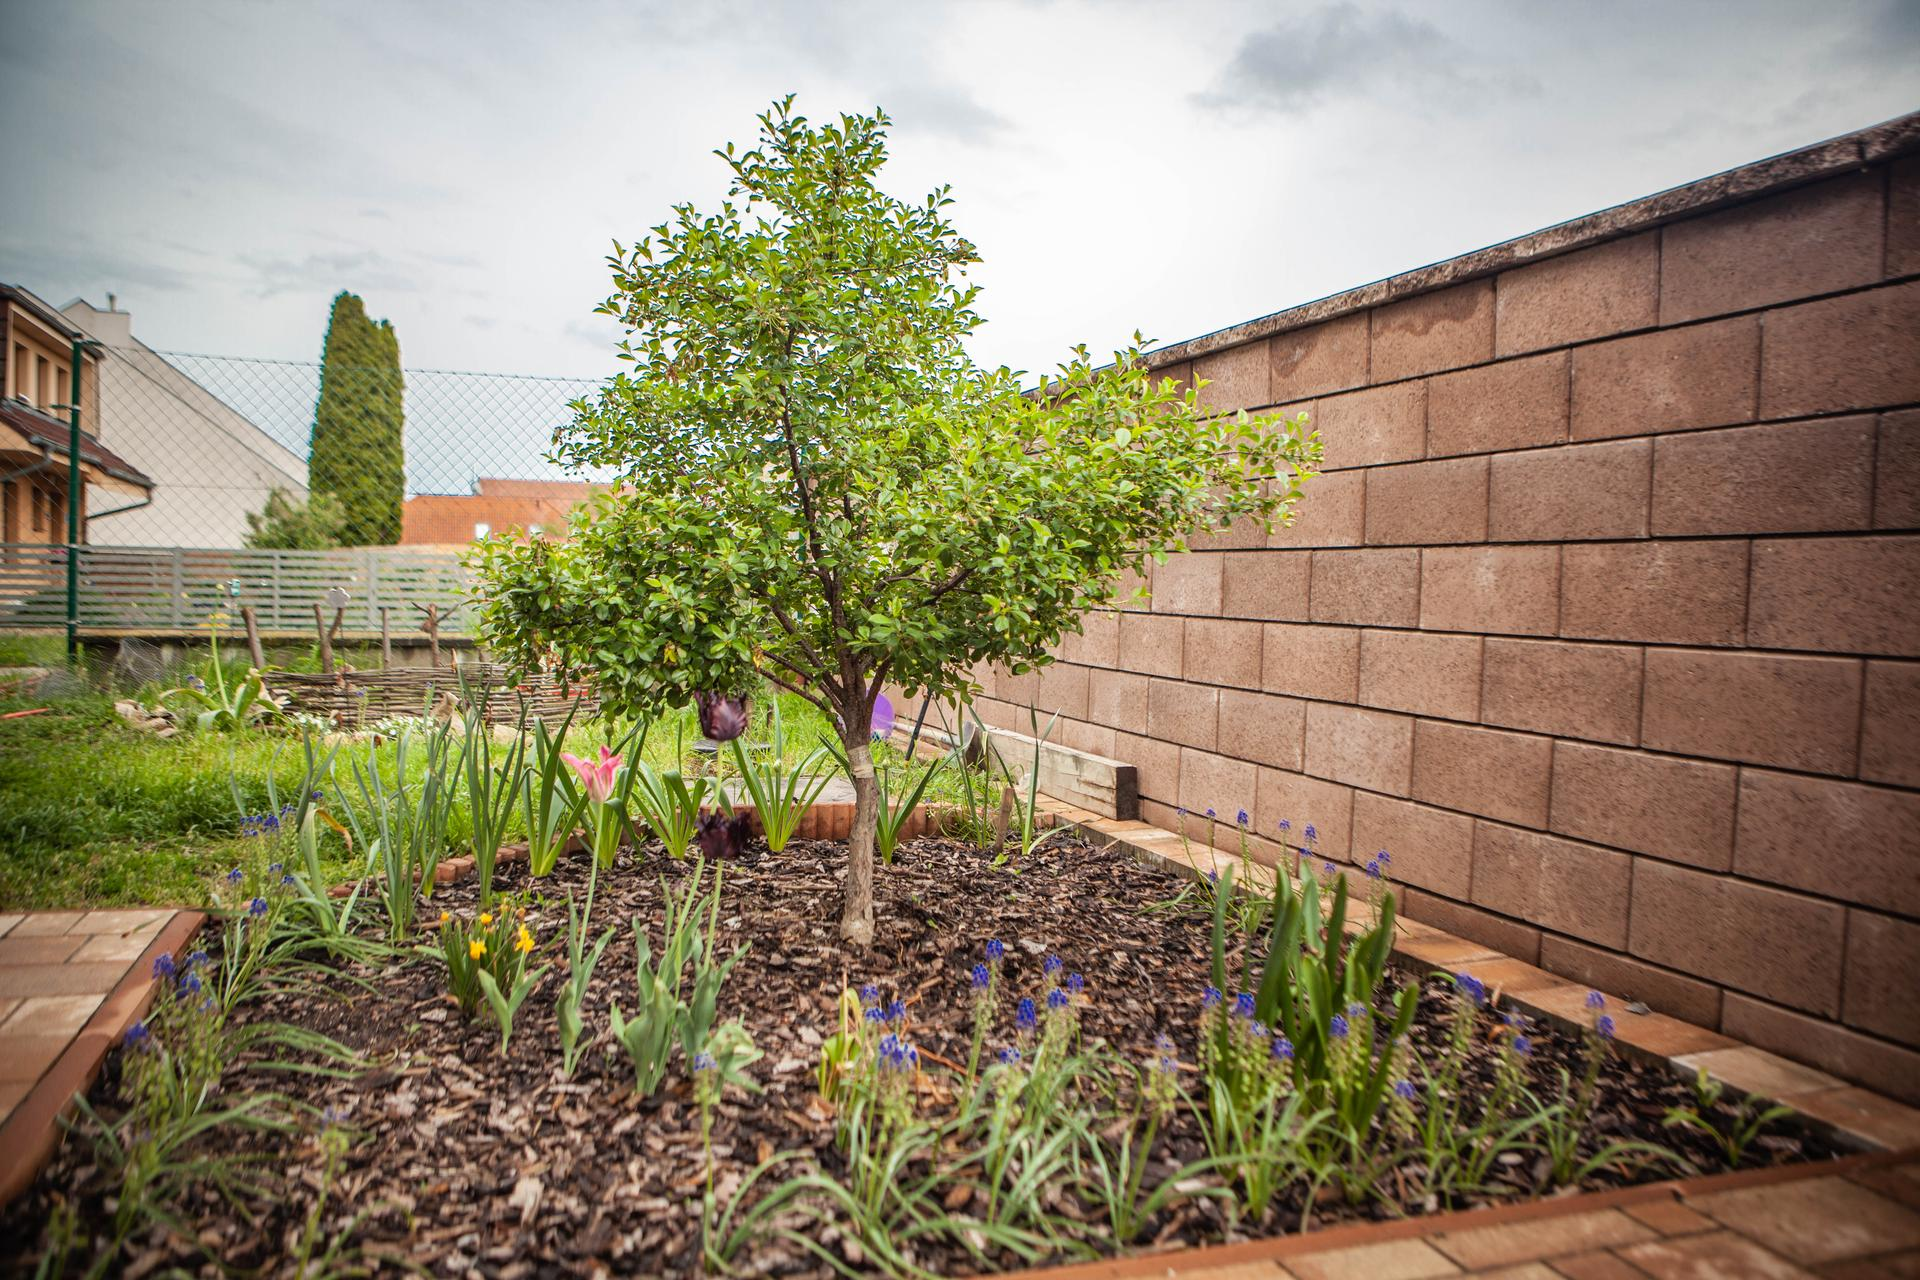 U nas v zahrade v roku 2021 - zahon pod visnou, na jesen doplnim o cibulky cesnakov drum sticks a tulipanov, lebo akosi vsetky nepovychadzali z poslednej jesene